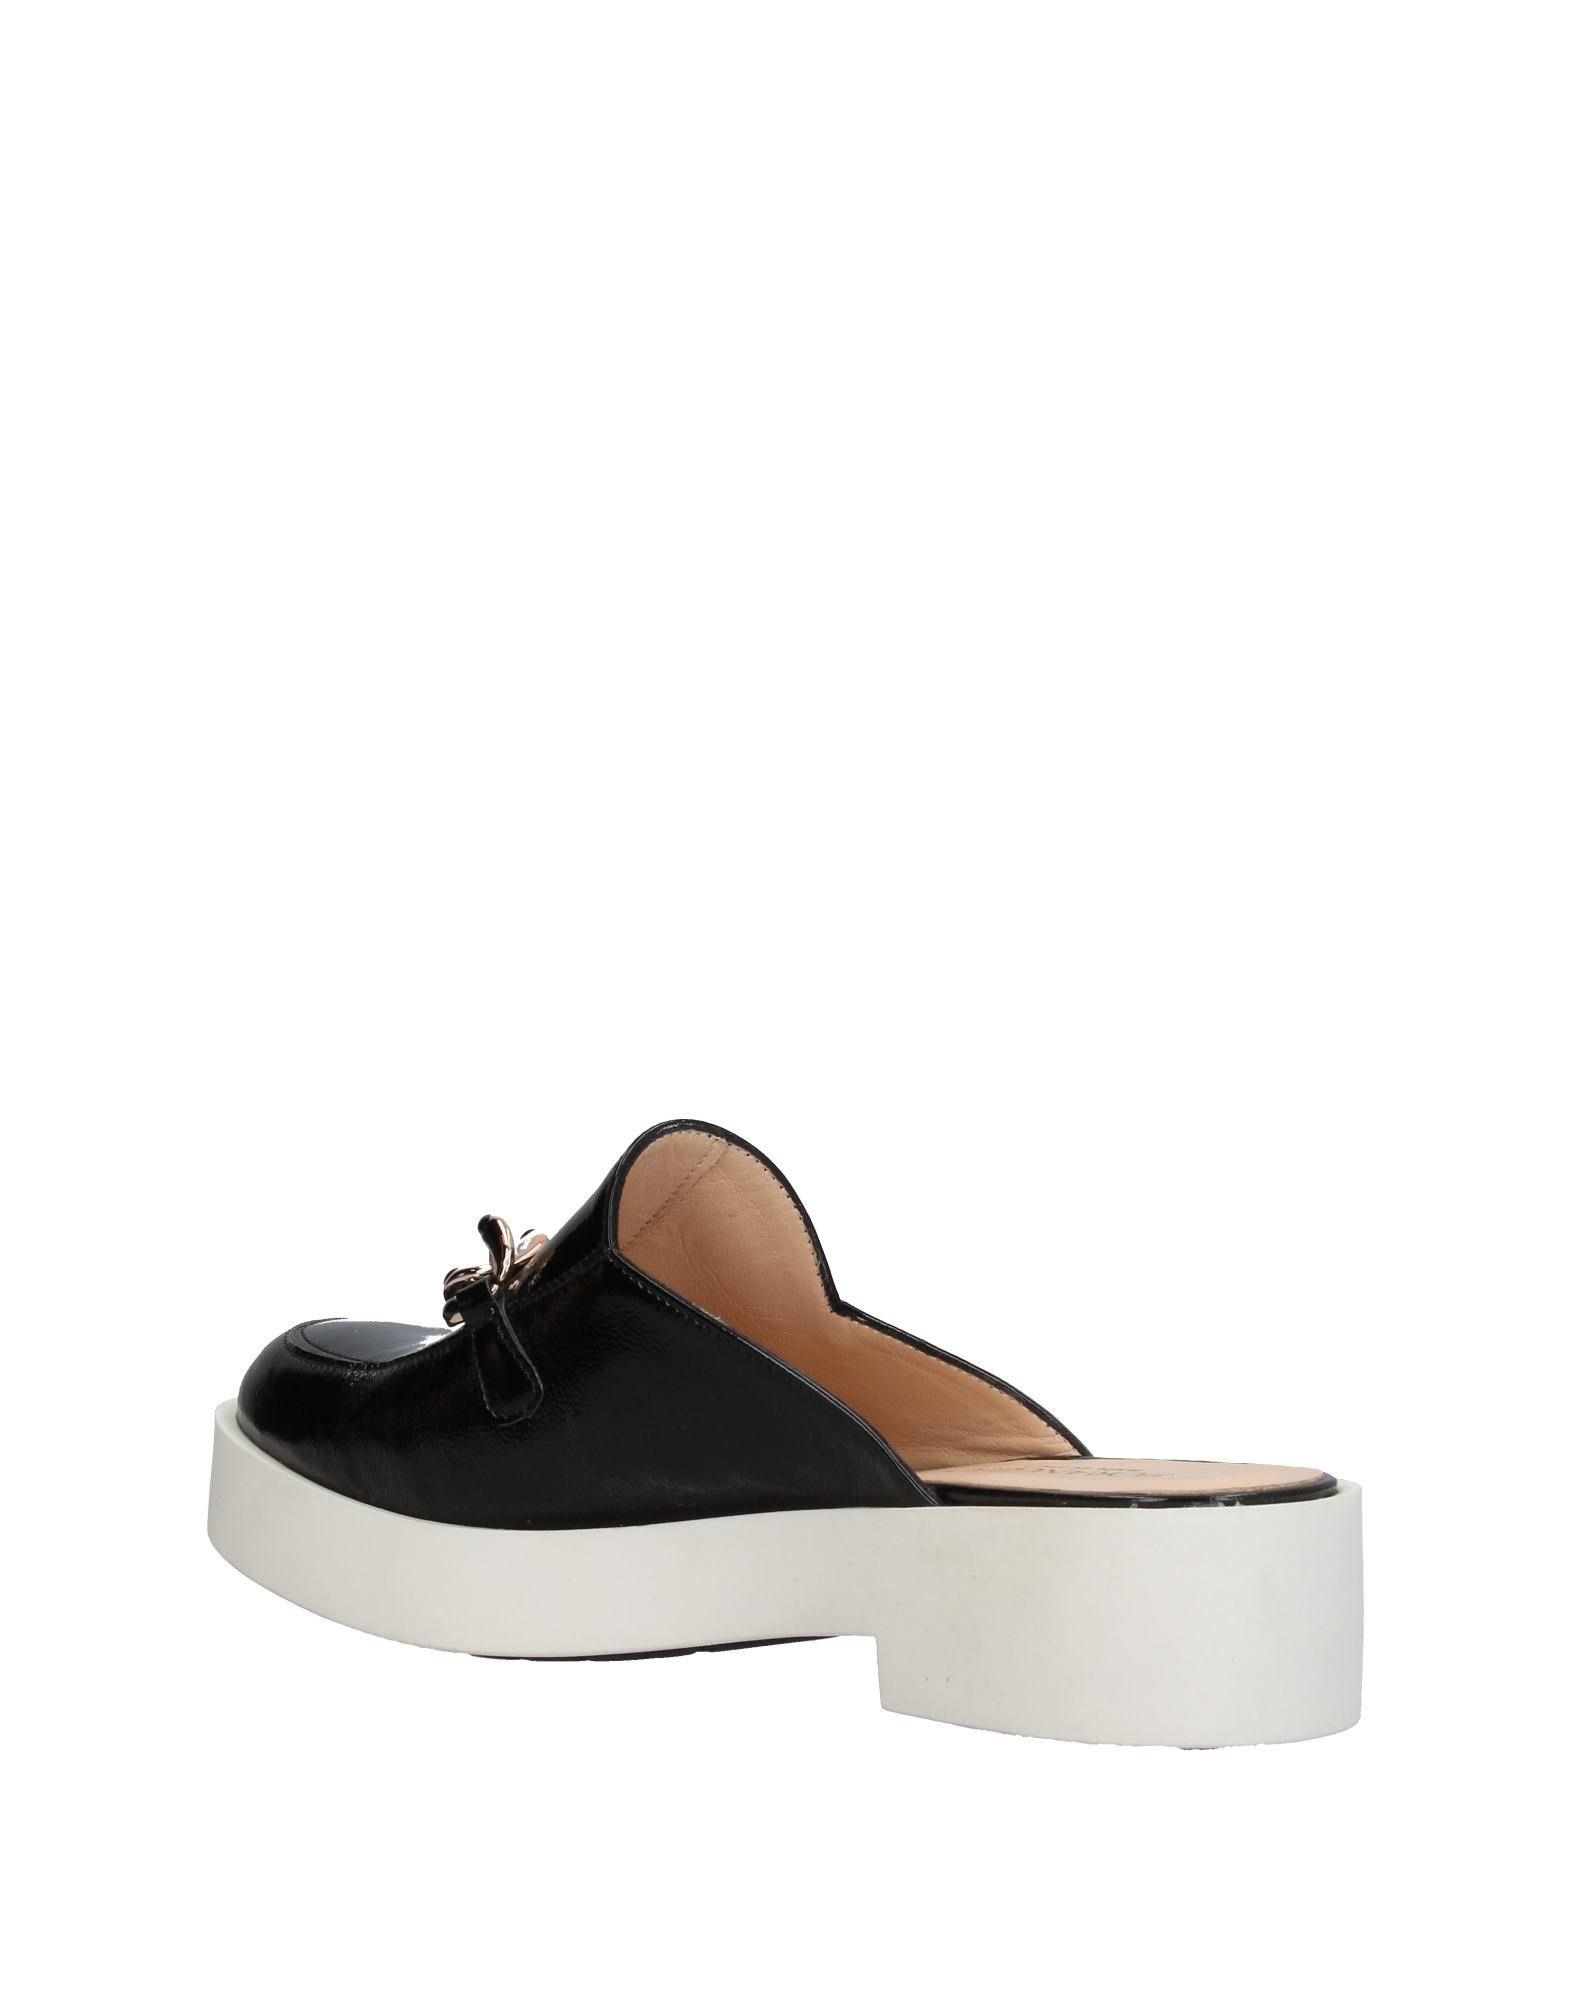 Chaussures - Mules Fiorangelo Jbuq5